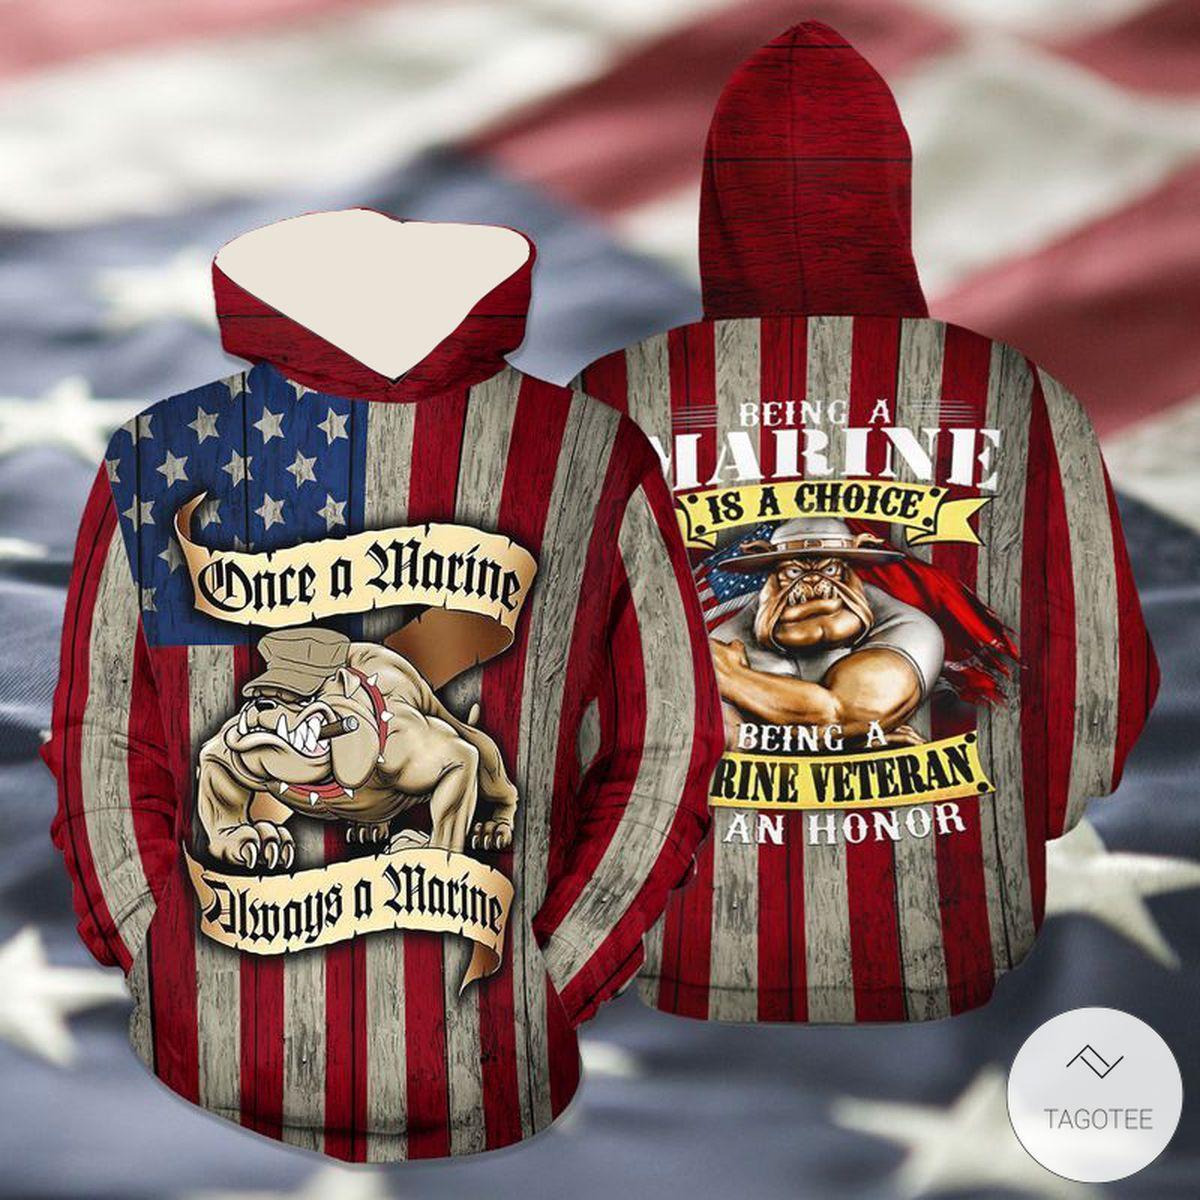 Once-A-Marine-Always-A-Marine-Being-A-Marine-Veteran-Was-An-Honor-3D-Hoodie